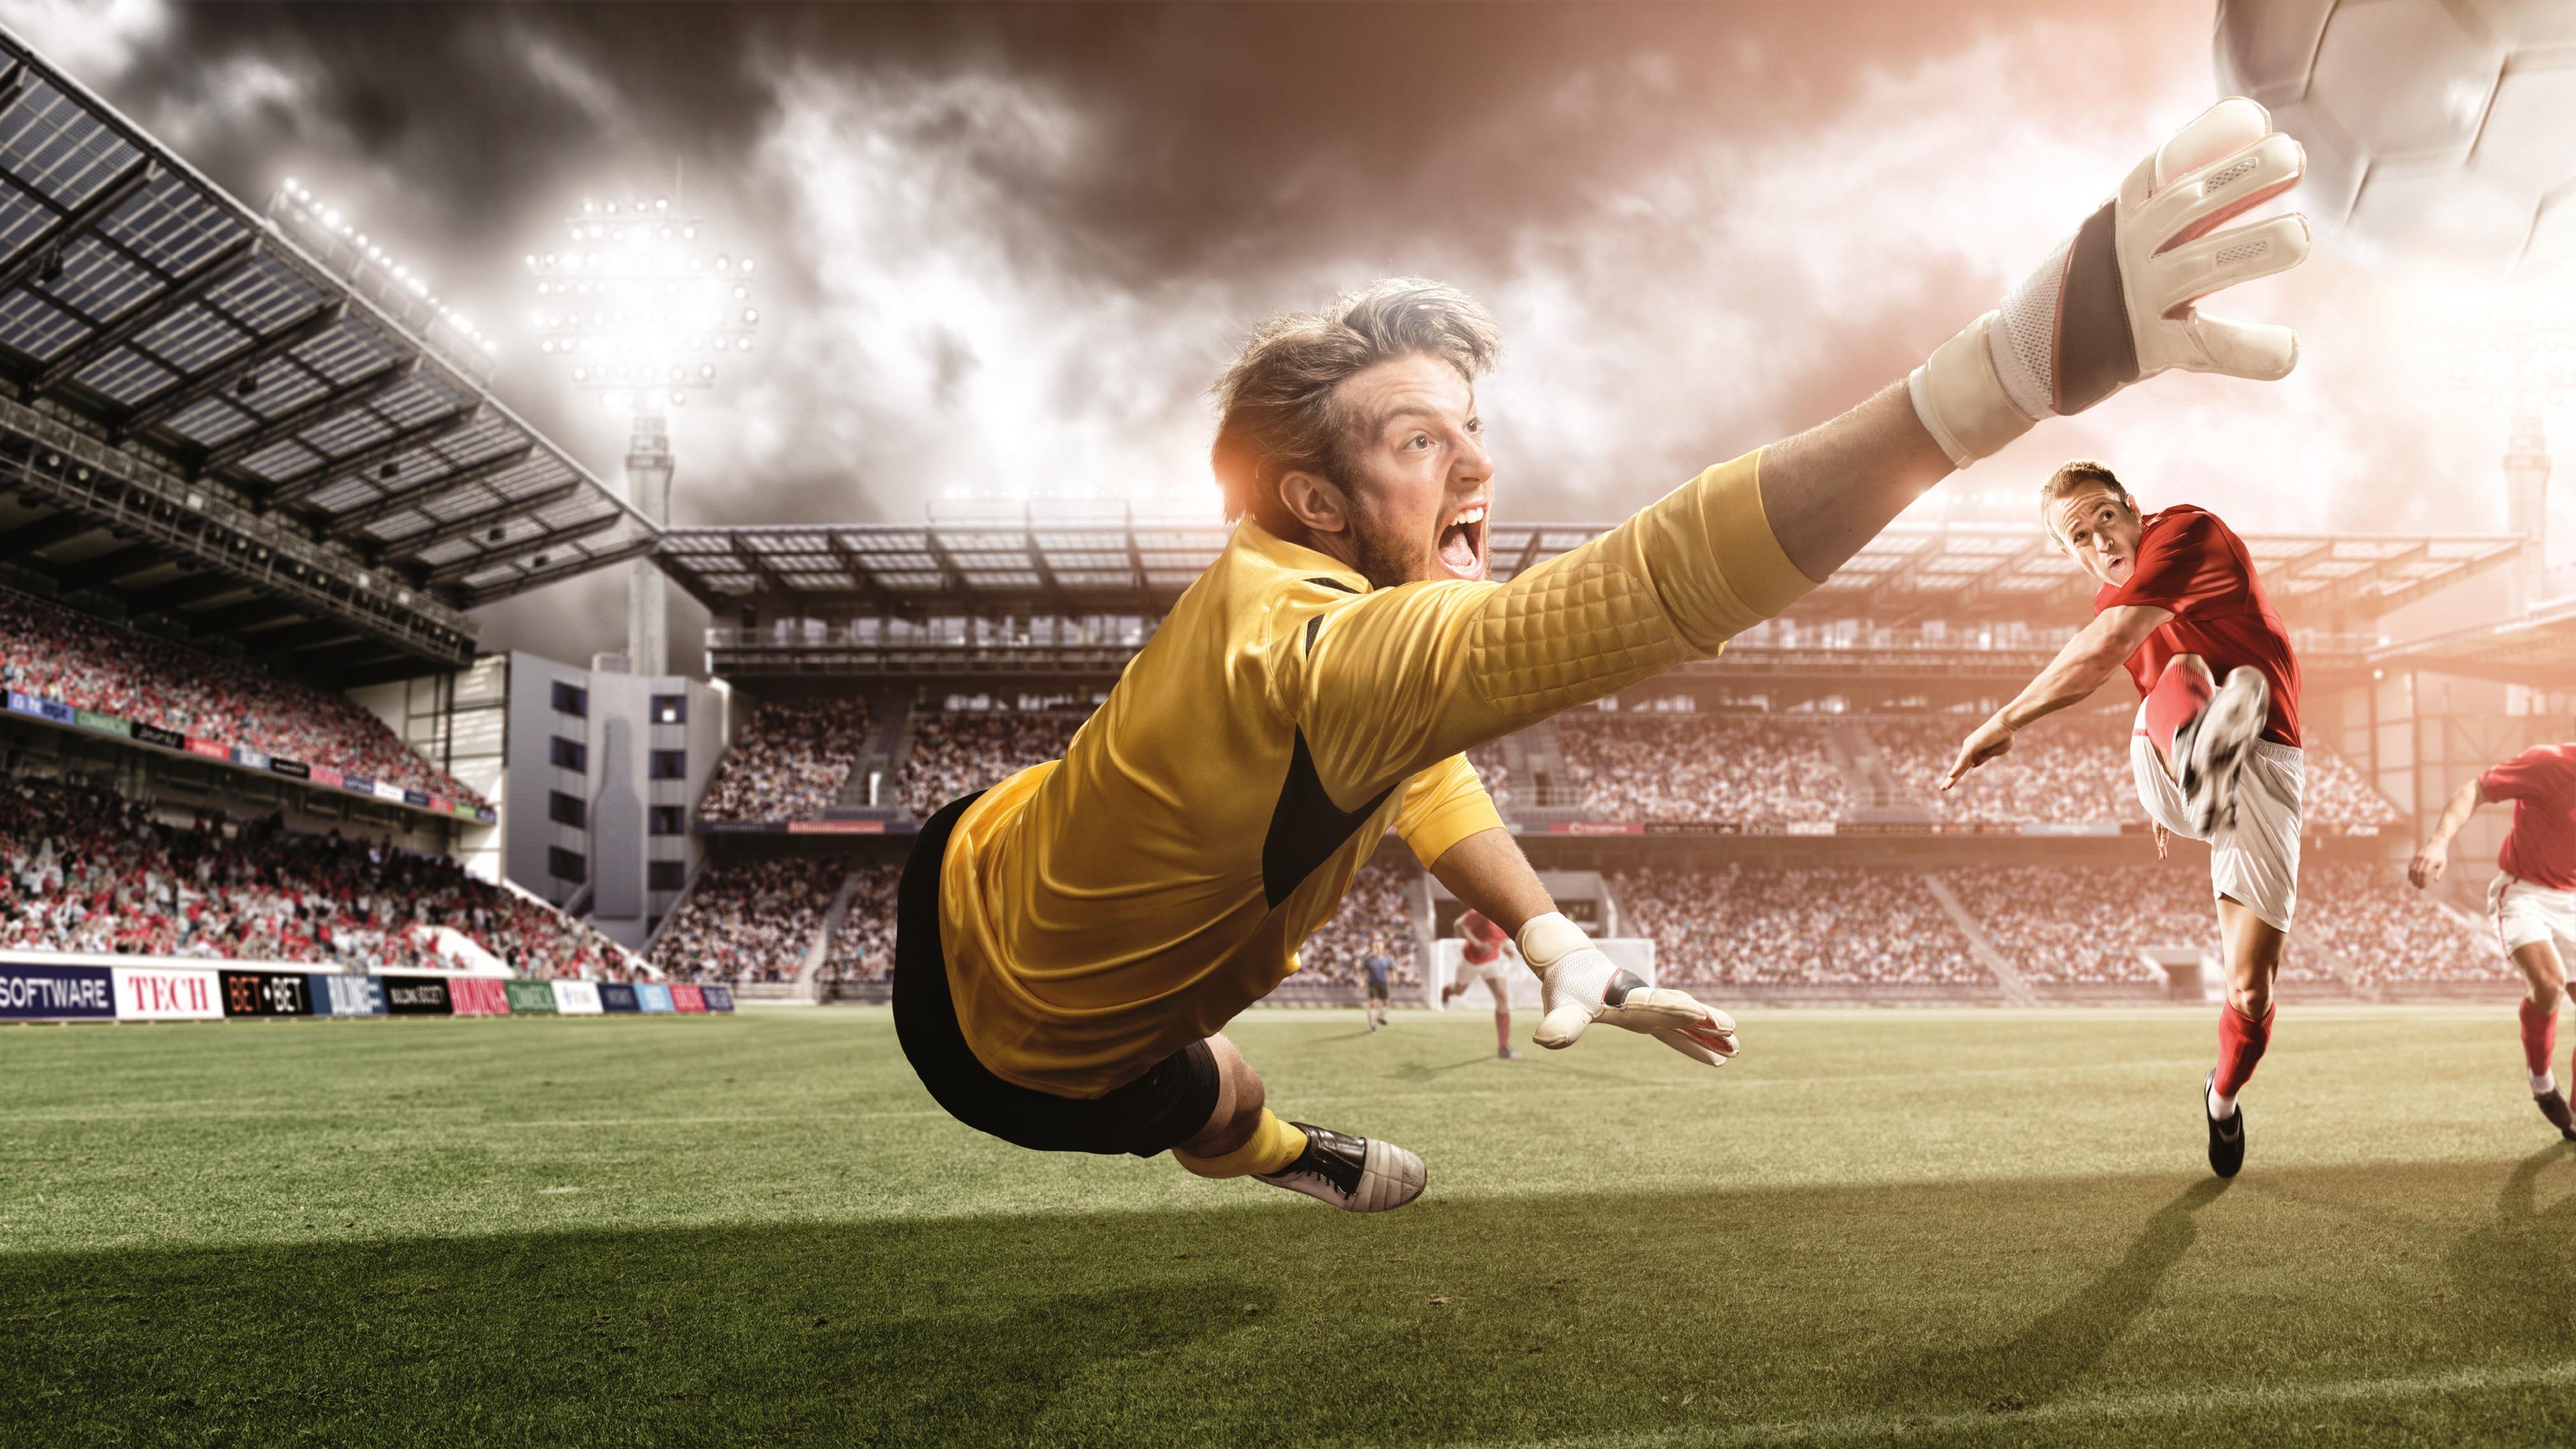 Hd Desktop Wallpaper For Football Lovers: Hd Football Wallpapers